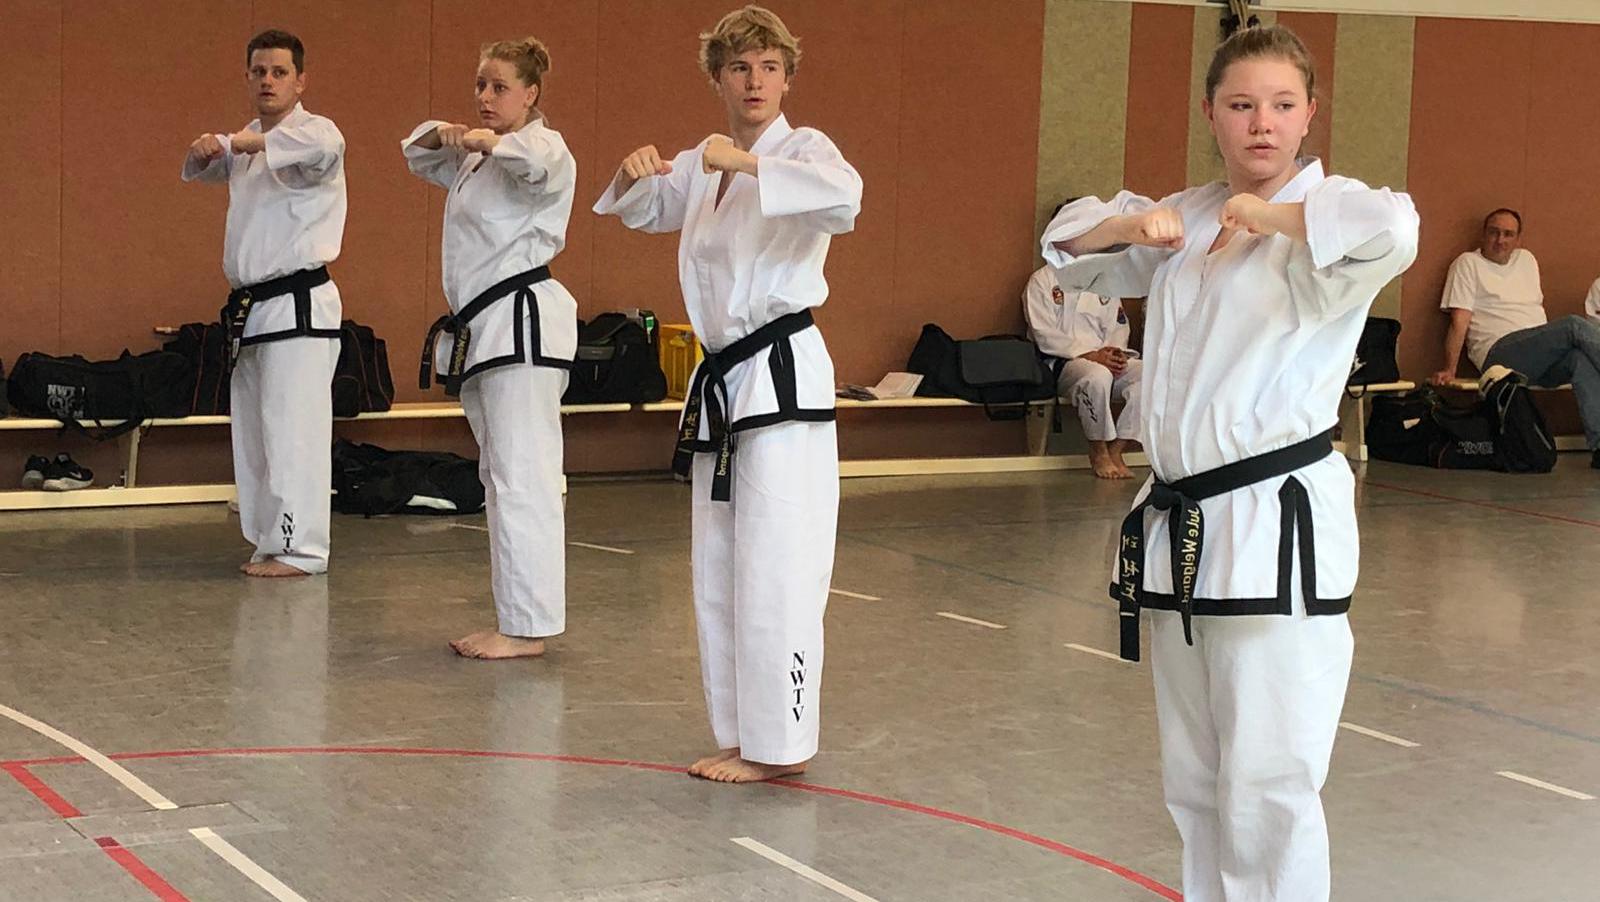 Besorgniserregendste Entwicklung im ITF Taekwon-Do